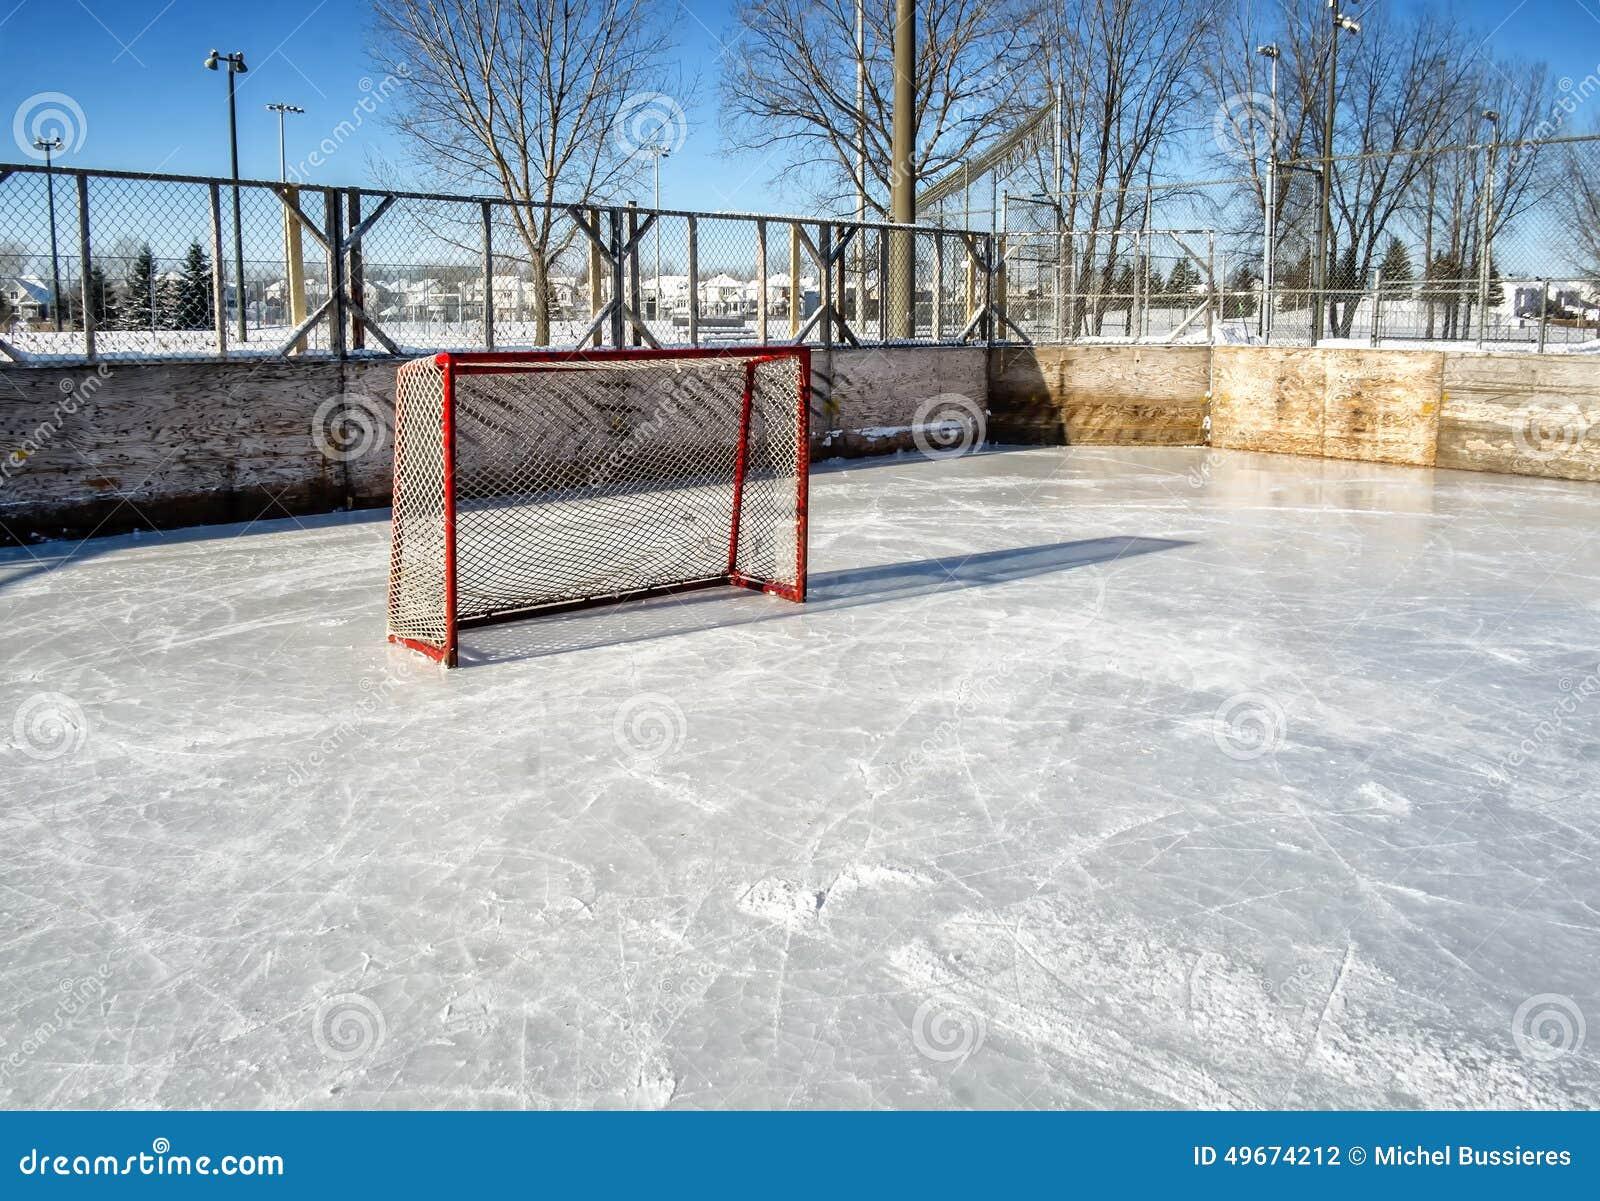 Äußere Hockeyeisbahn